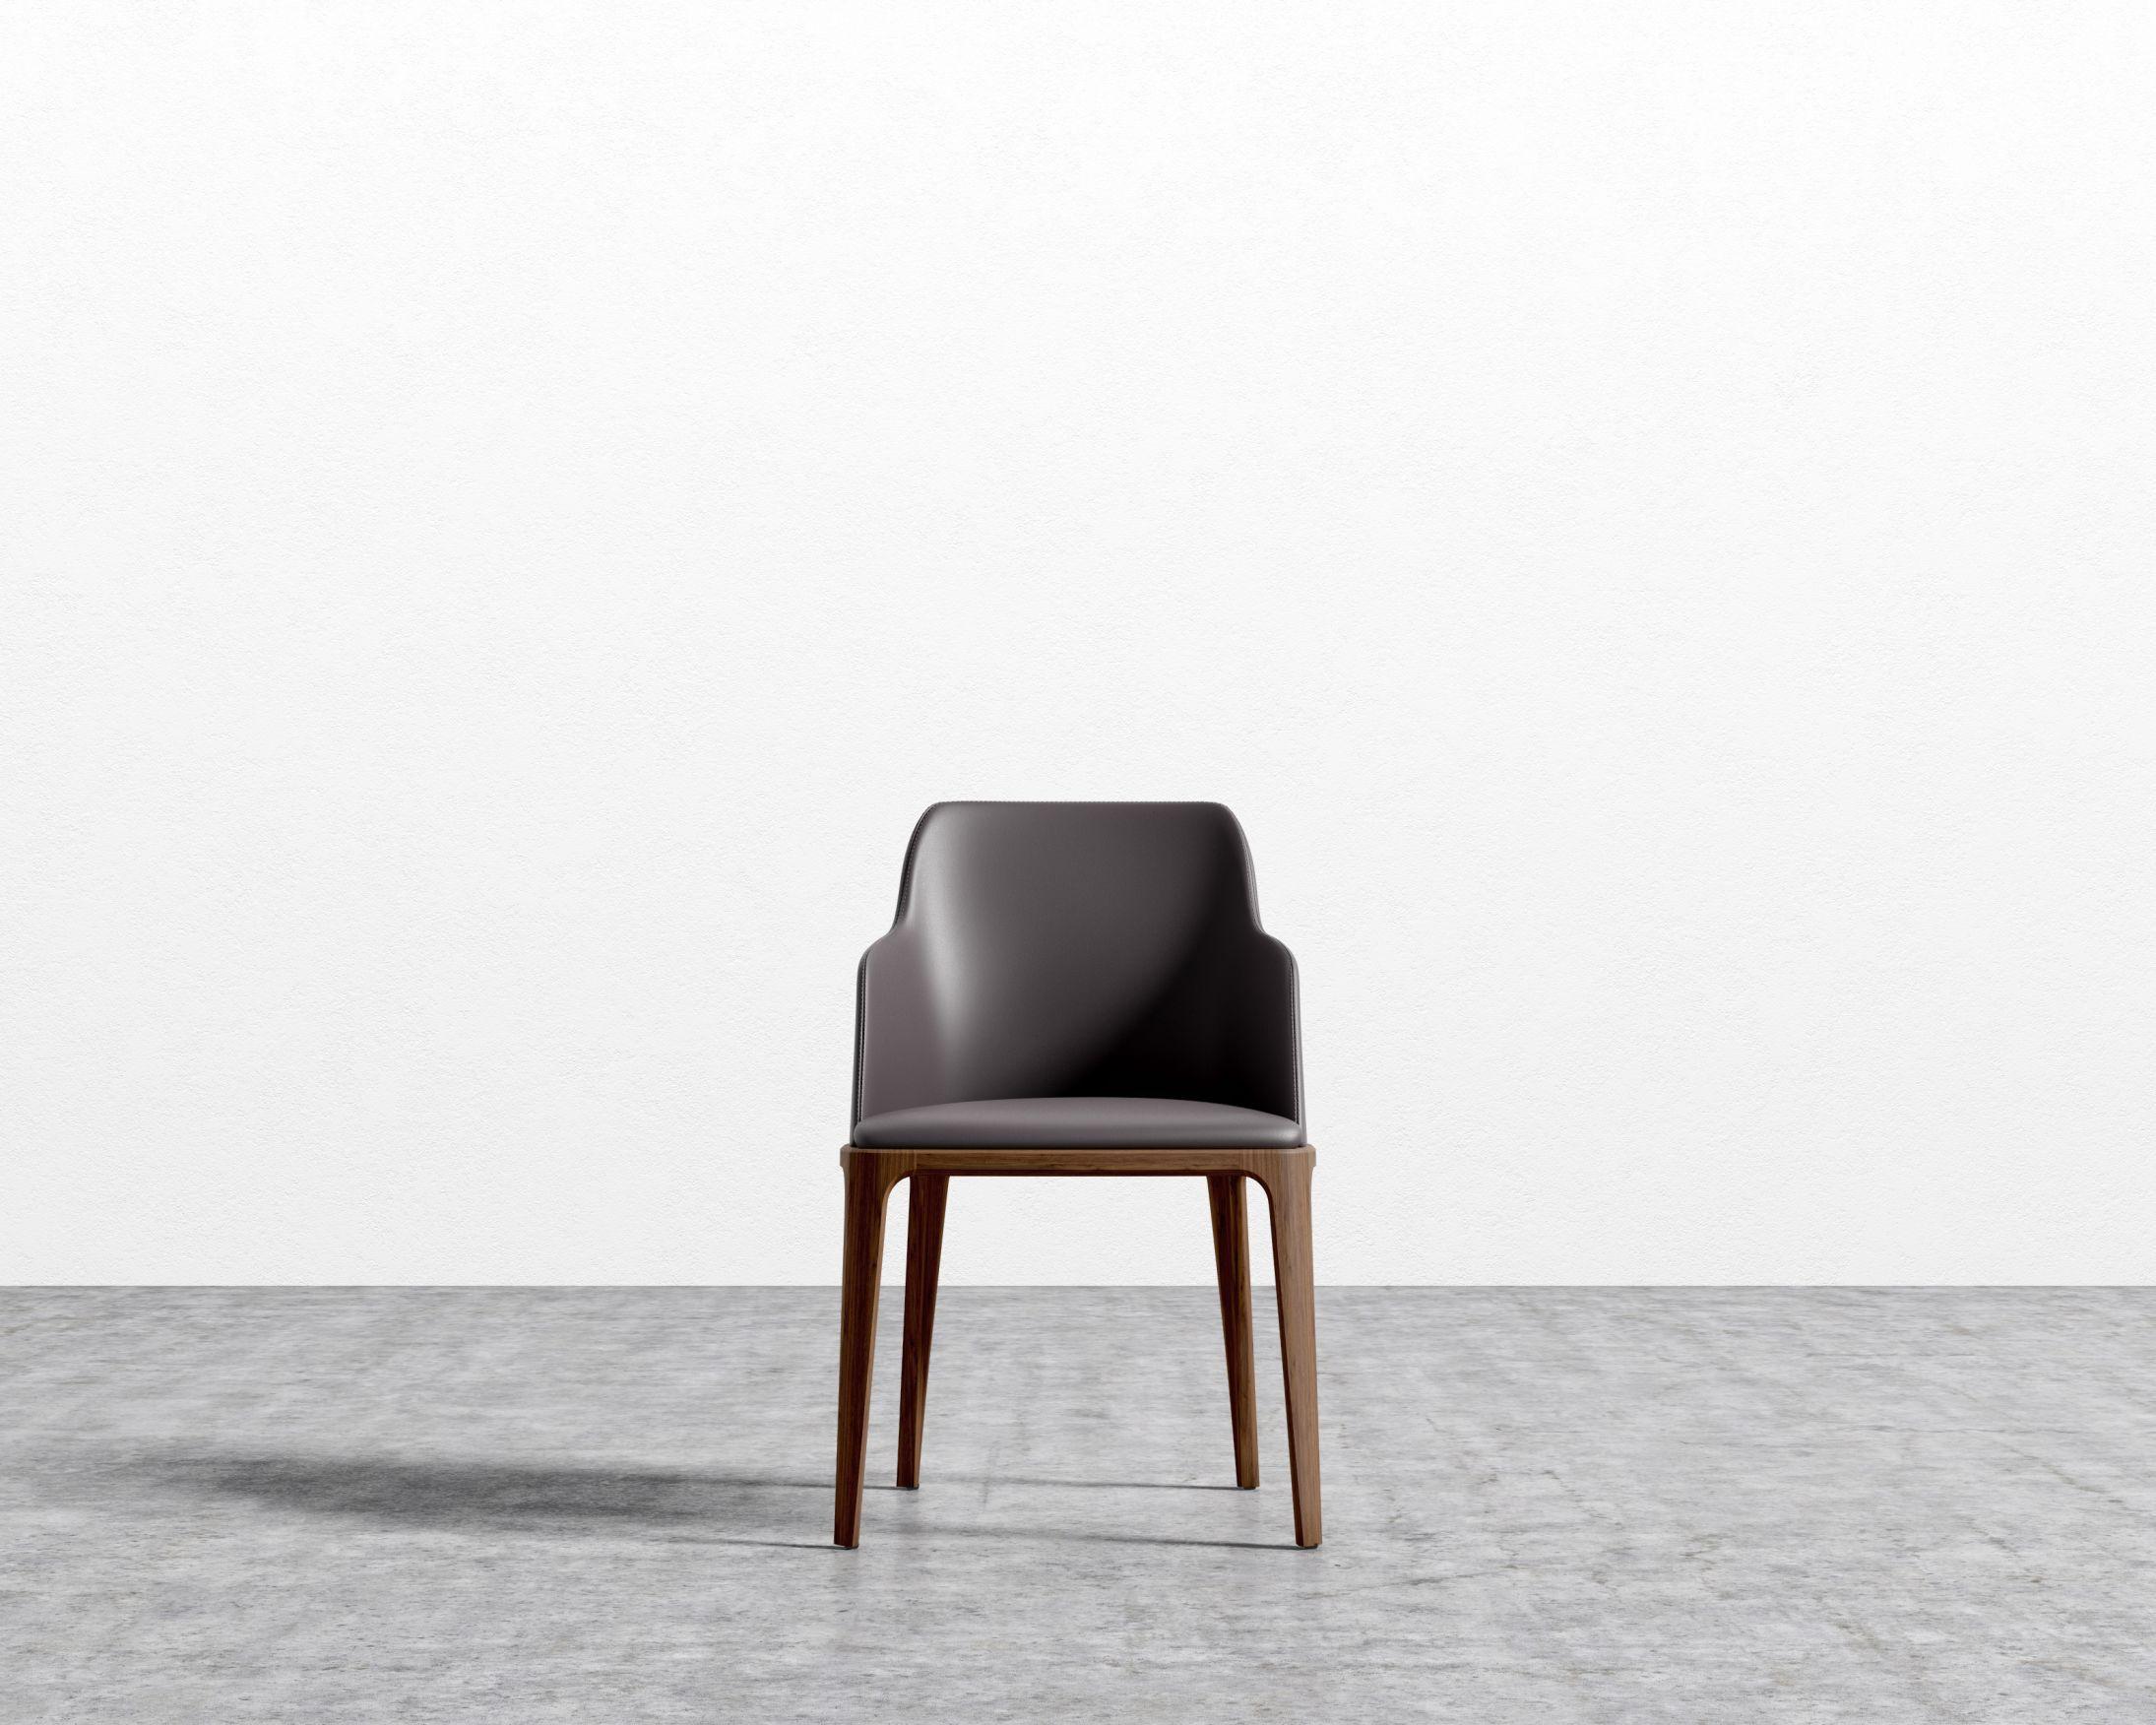 Astounding Aubrey Armchair Rove Concepts Rove Concepts Mid Century Creativecarmelina Interior Chair Design Creativecarmelinacom